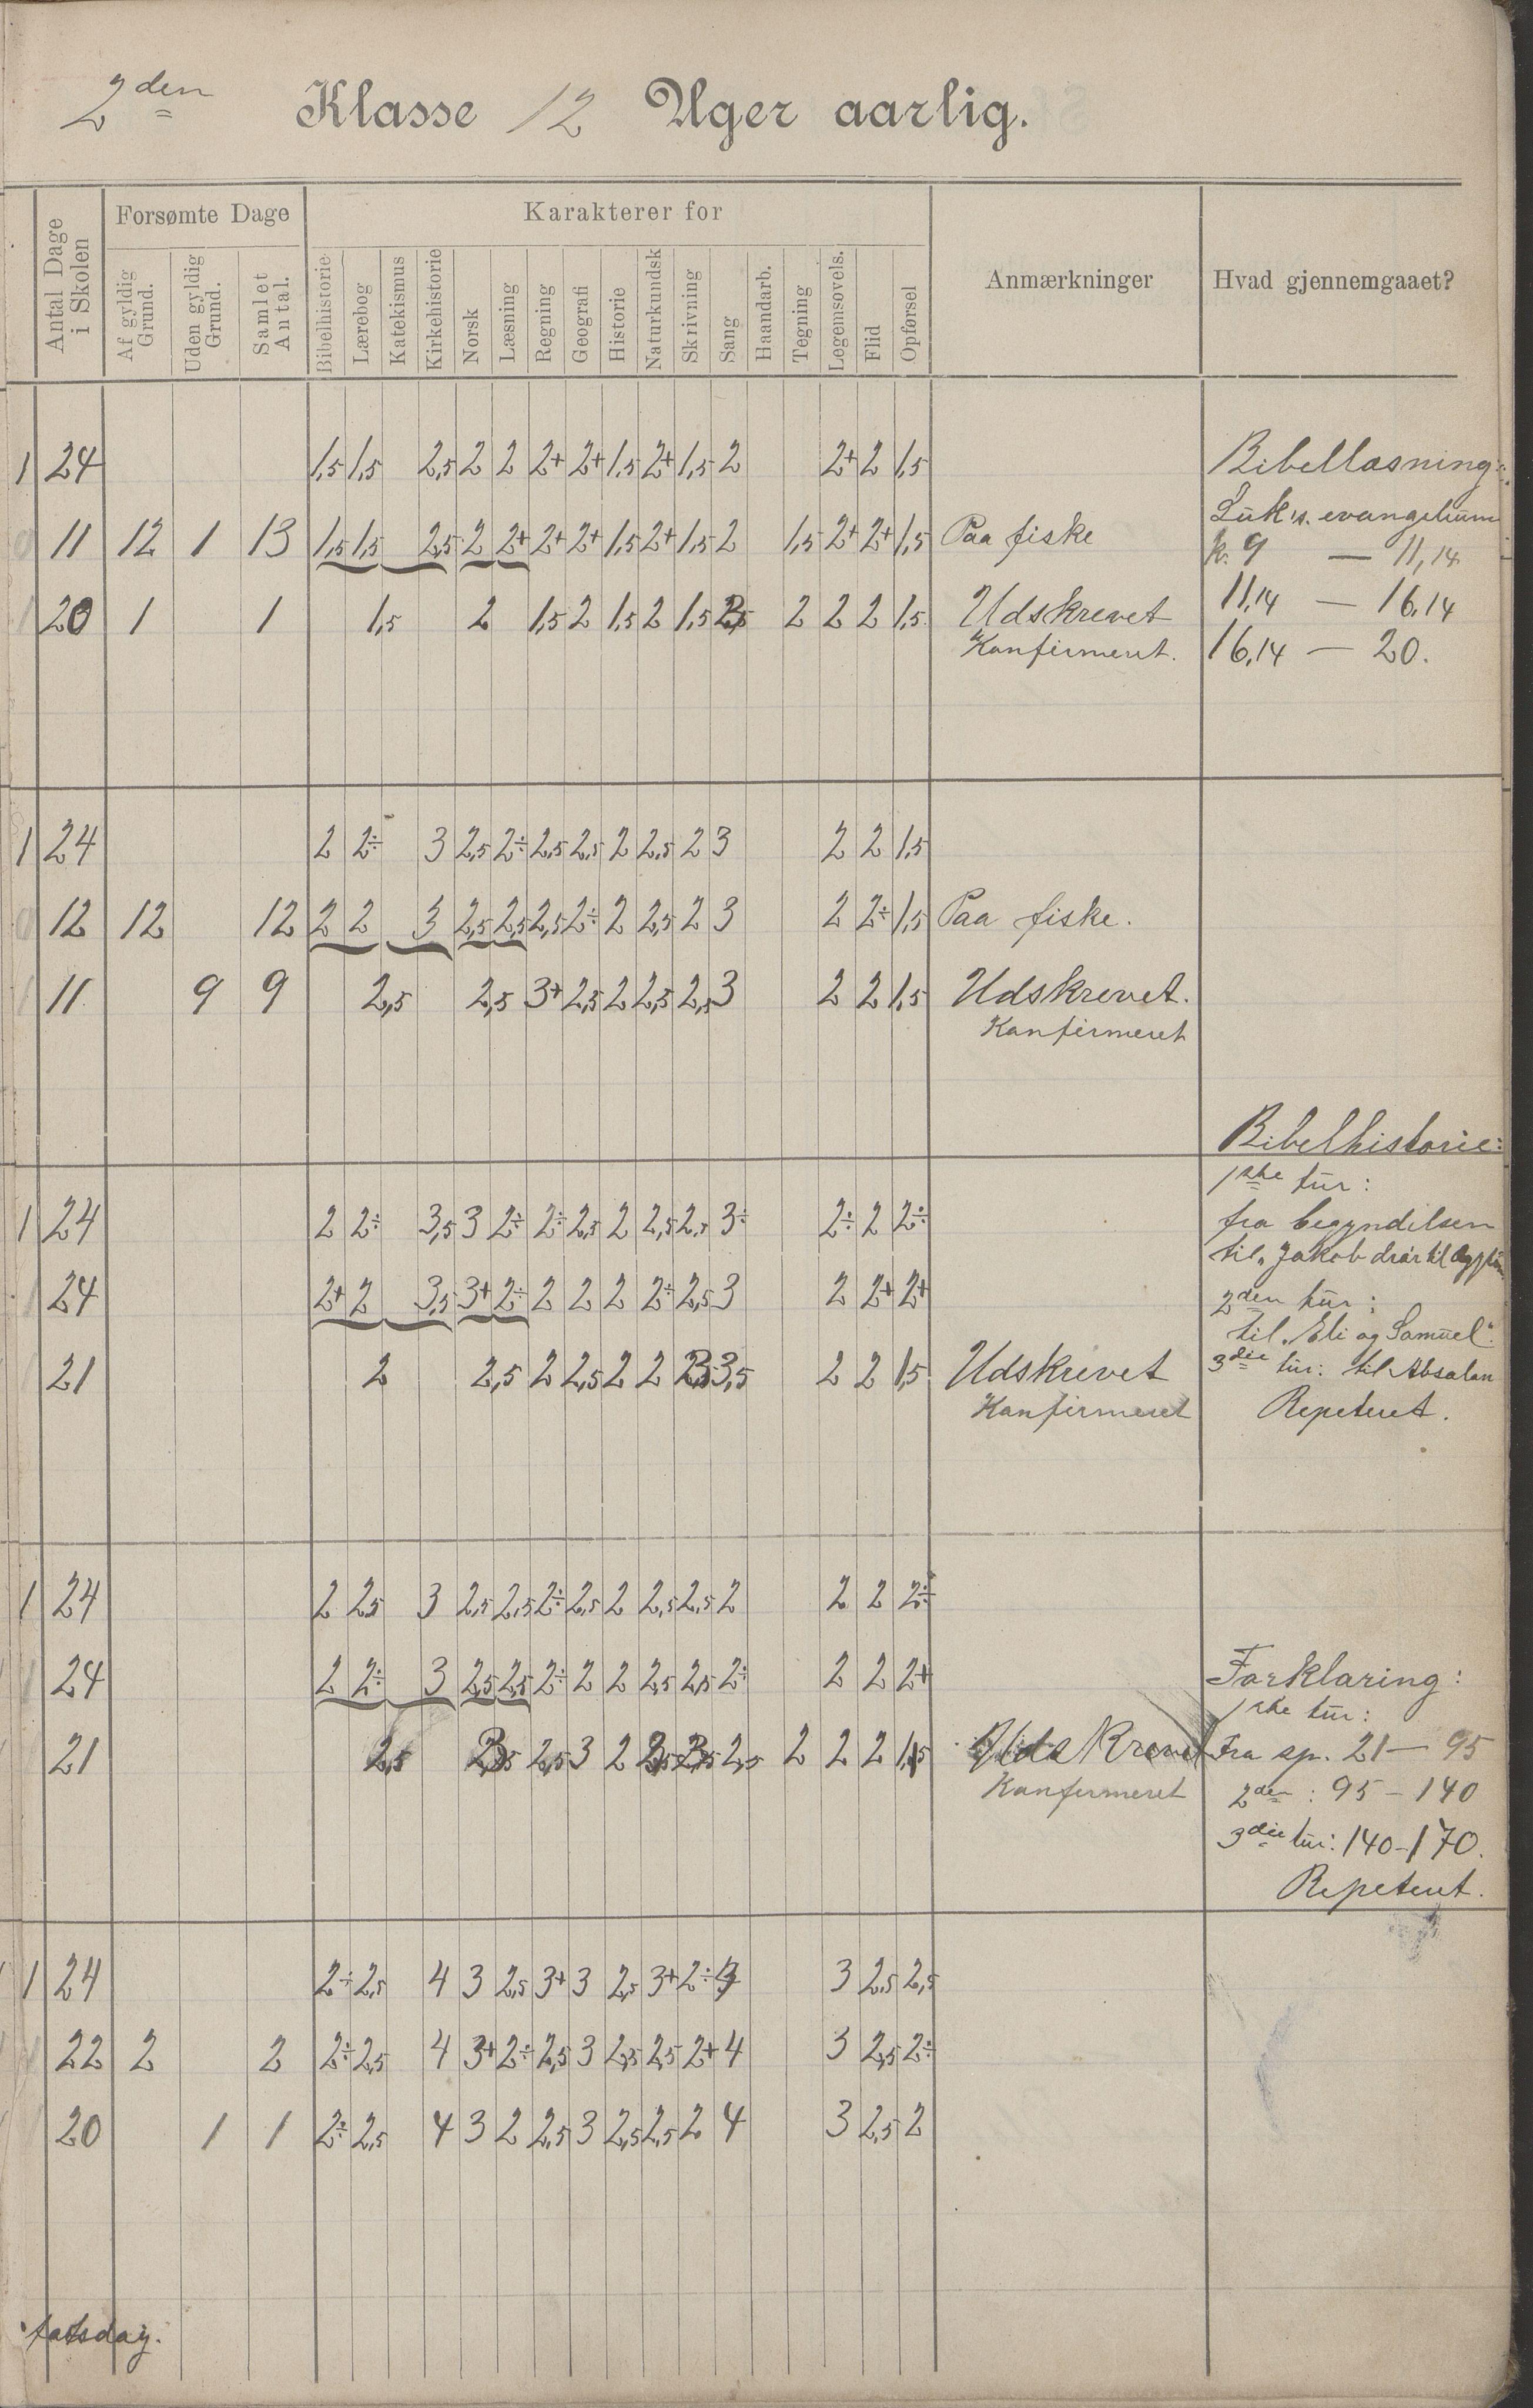 AIN, Hadsel kommune. Budal skolekrets, G/L0001: Skoleprotokoll Budal skole, 1902-1917